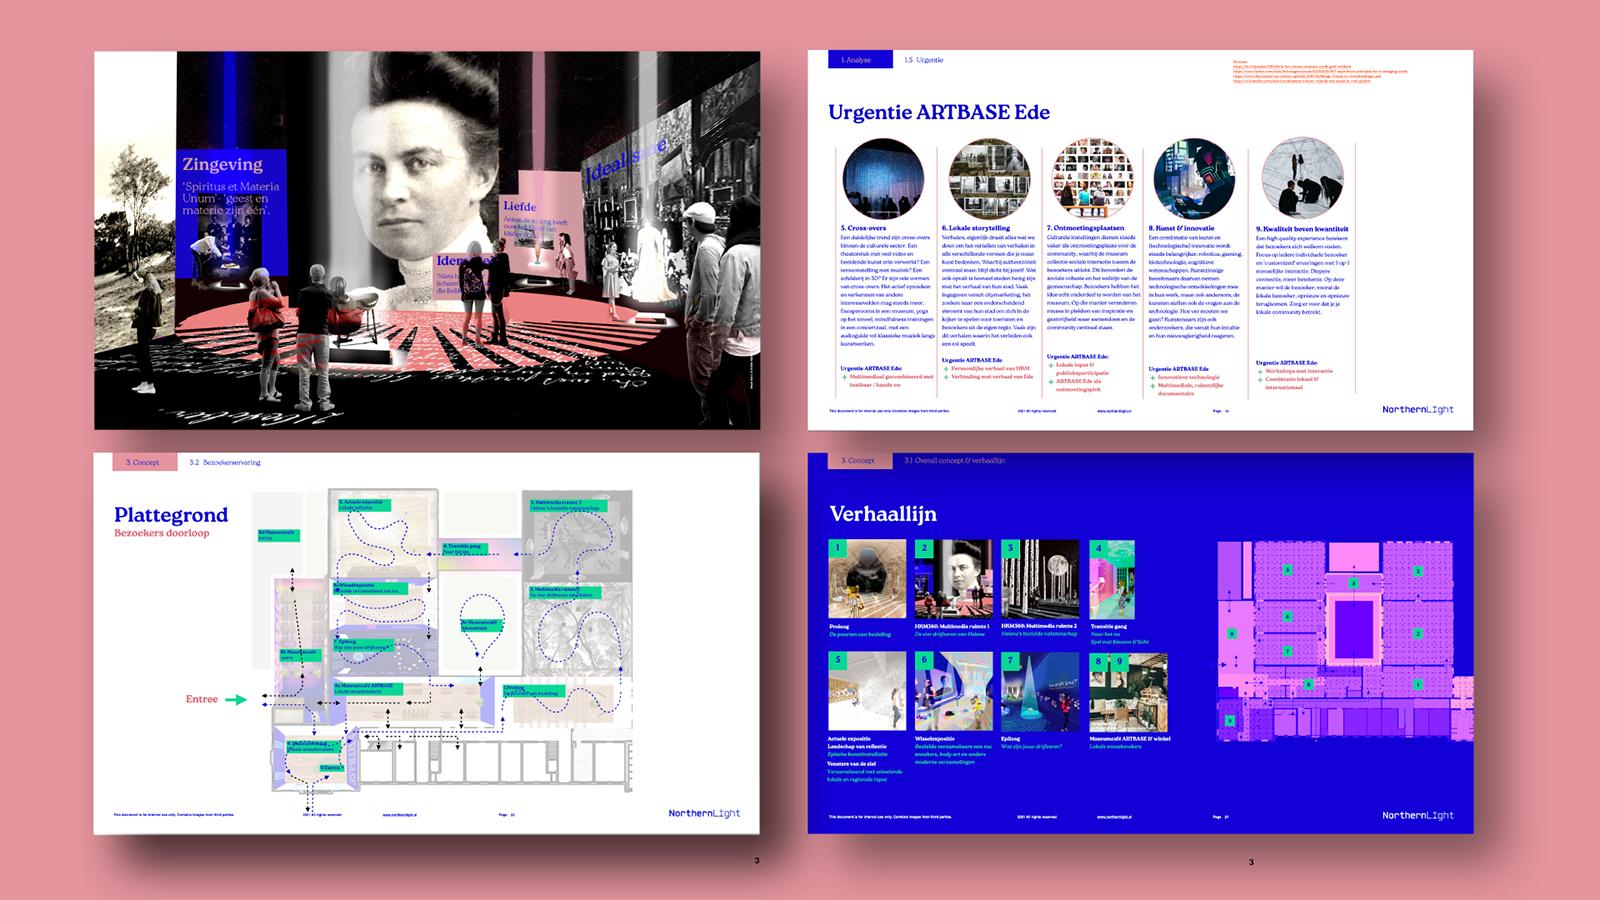 NorthernLight-ARTBASE-website-3